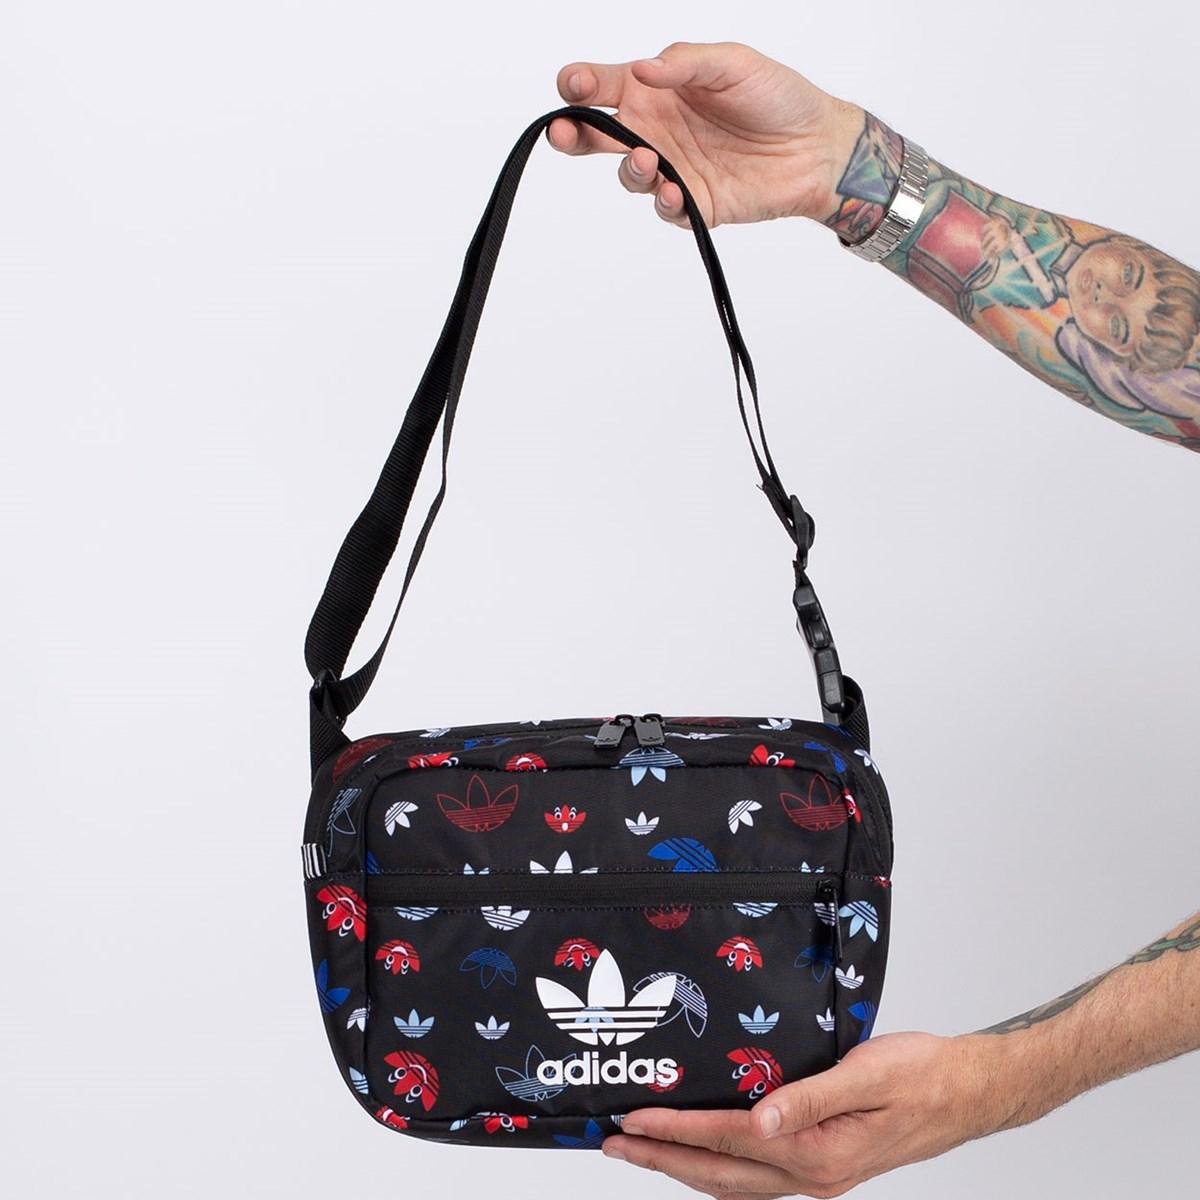 Bolsa adidas Sling Bag Black Multicolor GD3133